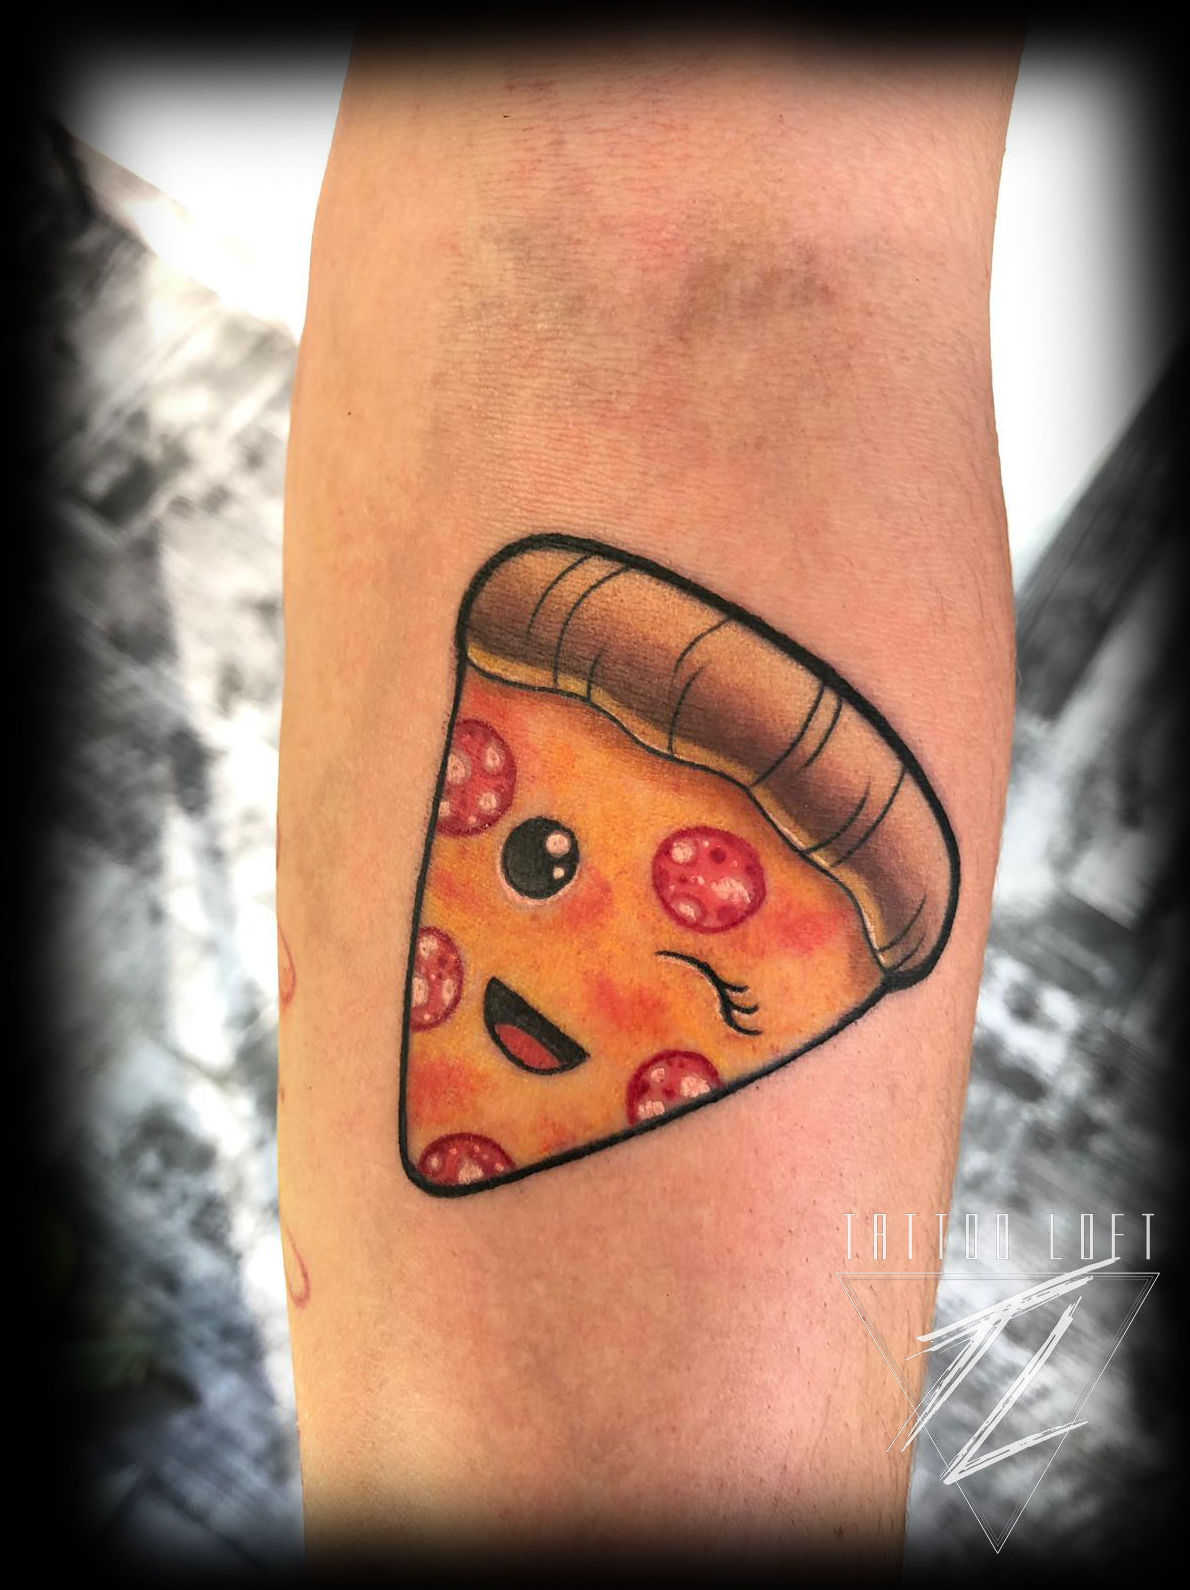 Foto 71 de Estudio artístico de tatuaje en  | Tattoo Loft